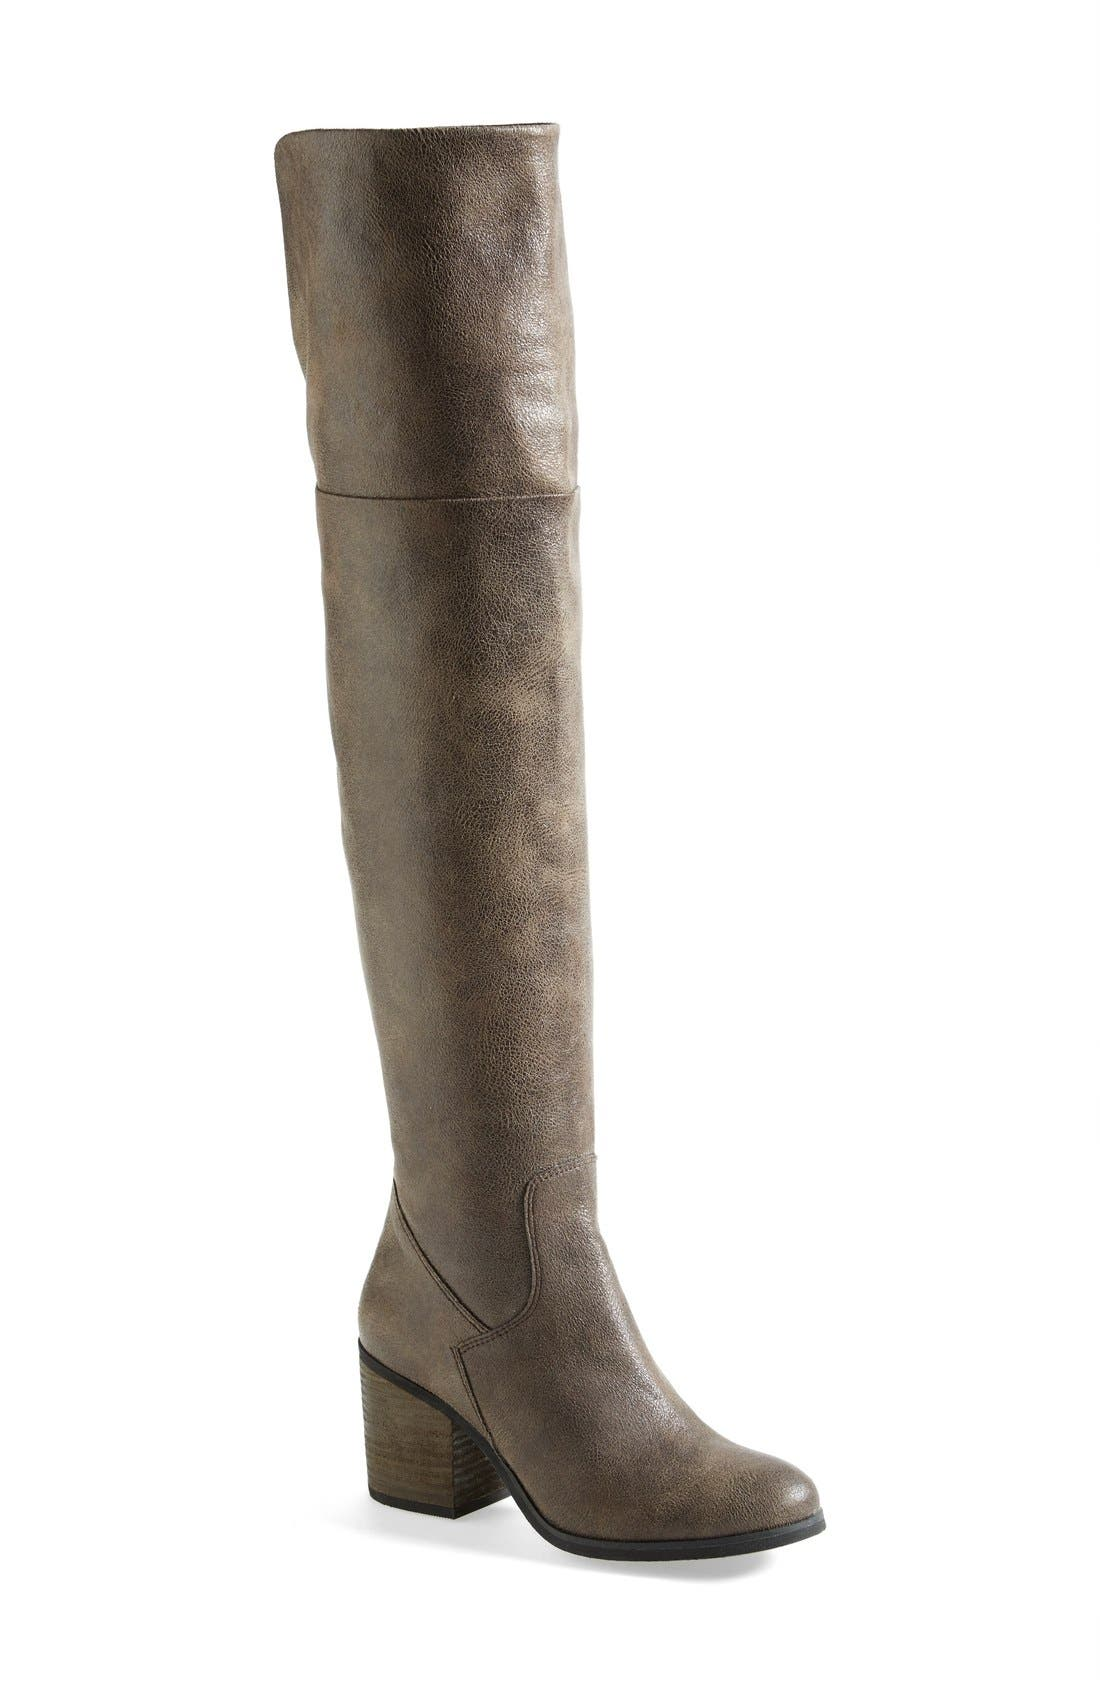 Main Image - Hinge Canton Over the Knee Boot (Women)